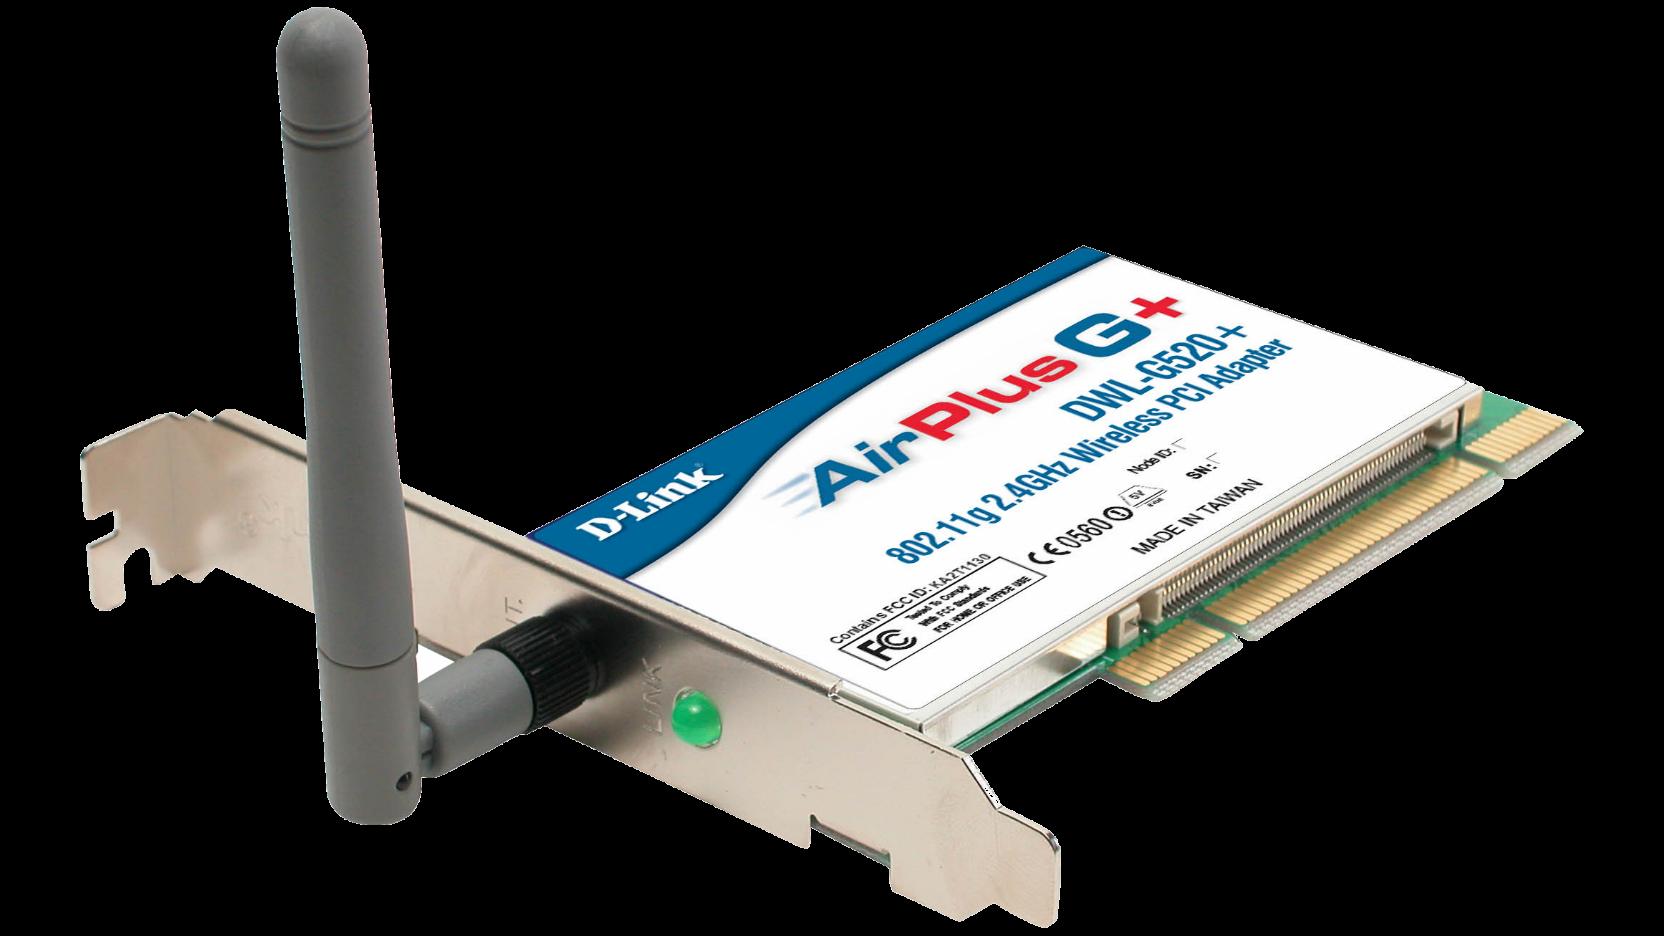 DLINK AIRPLUS XTREME G DWL-520 WINDOWS 7 X64 DRIVER